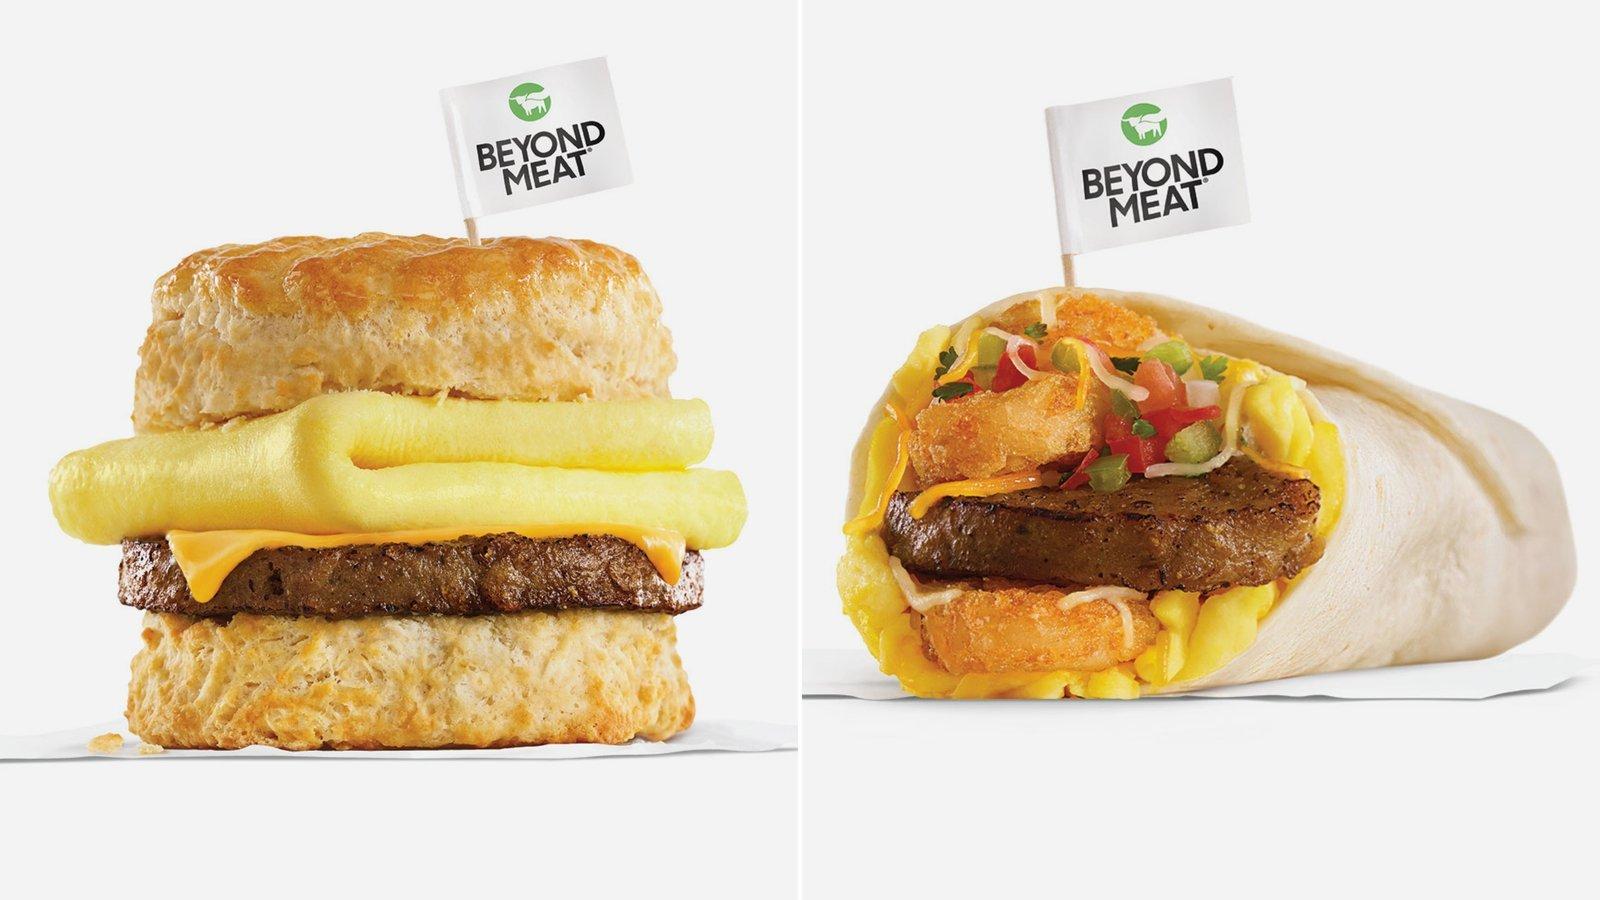 Carls Jr Beyond Meat Breakfast pictures